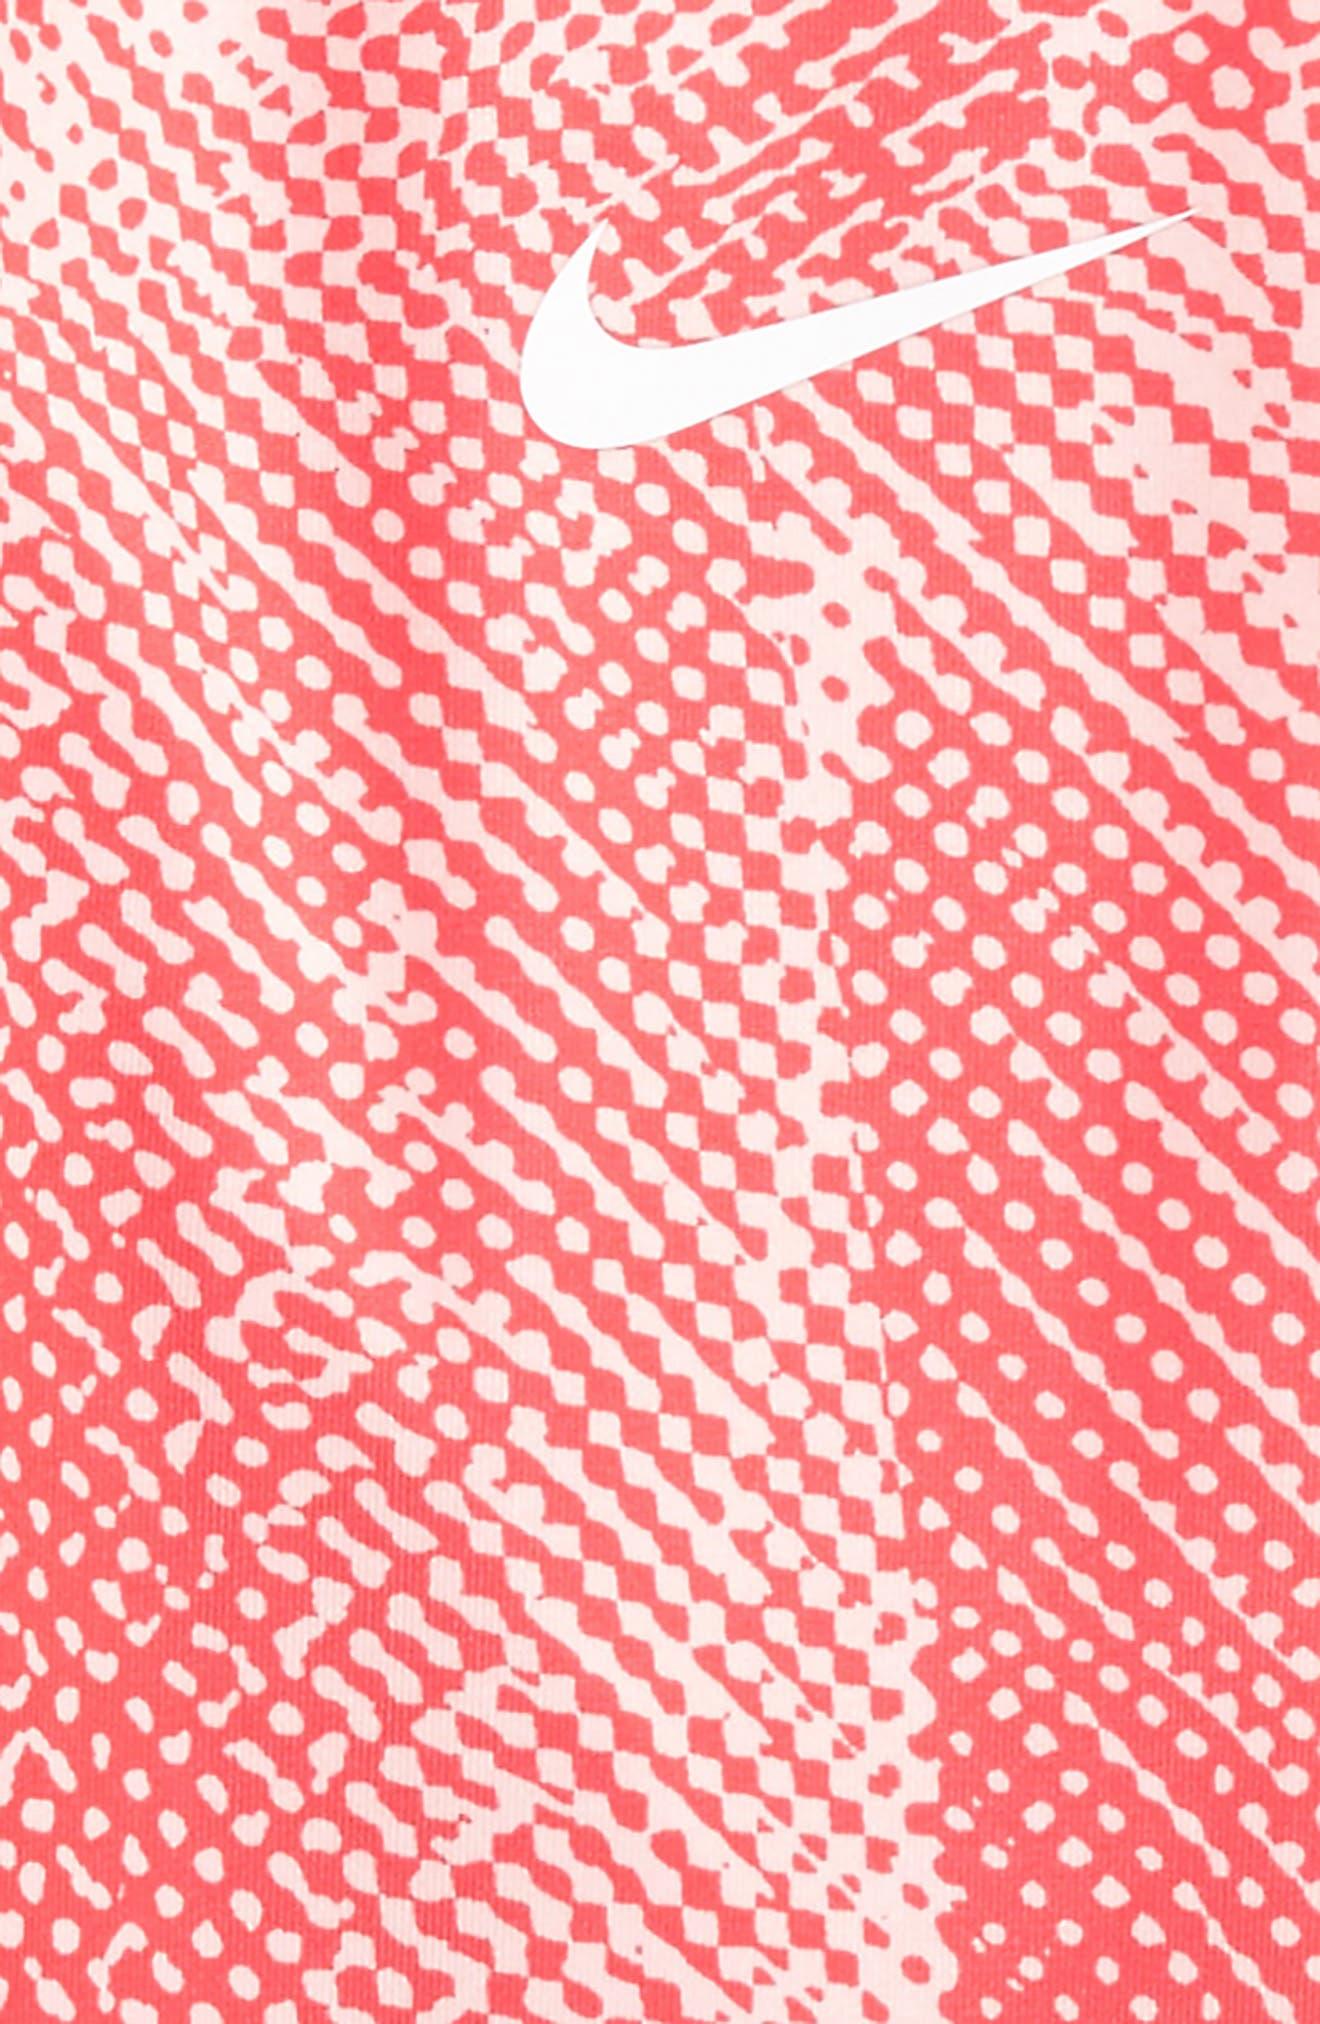 Dri-FIT Leggings,                             Alternate thumbnail 2, color,                             Fusion Red